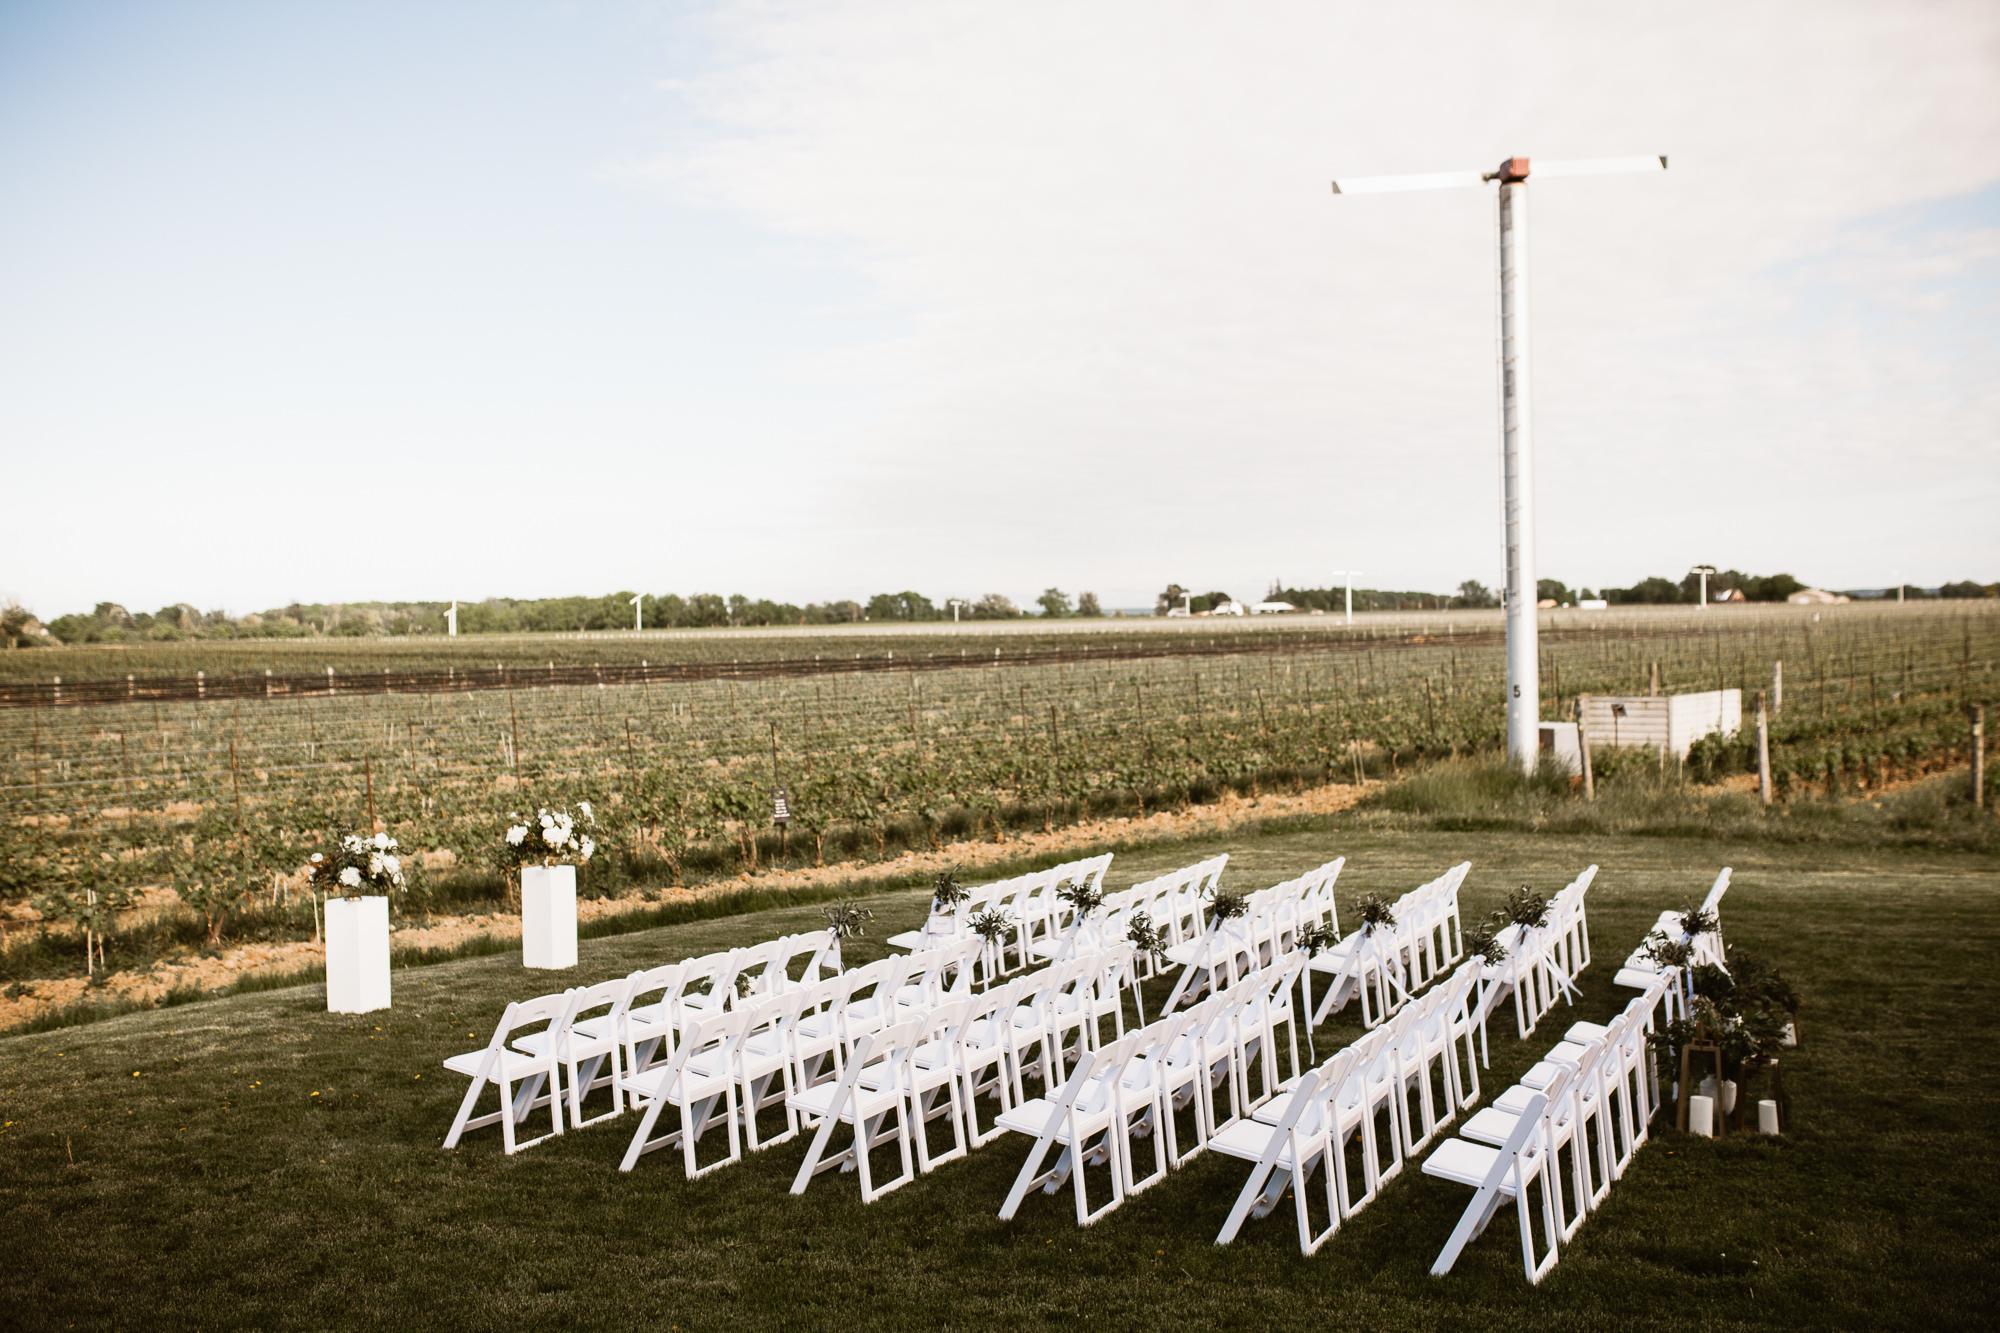 stratus-winery-wedding-vineyard-wedding-vineyard-bride-photo-by-reed-photography-035.jpg